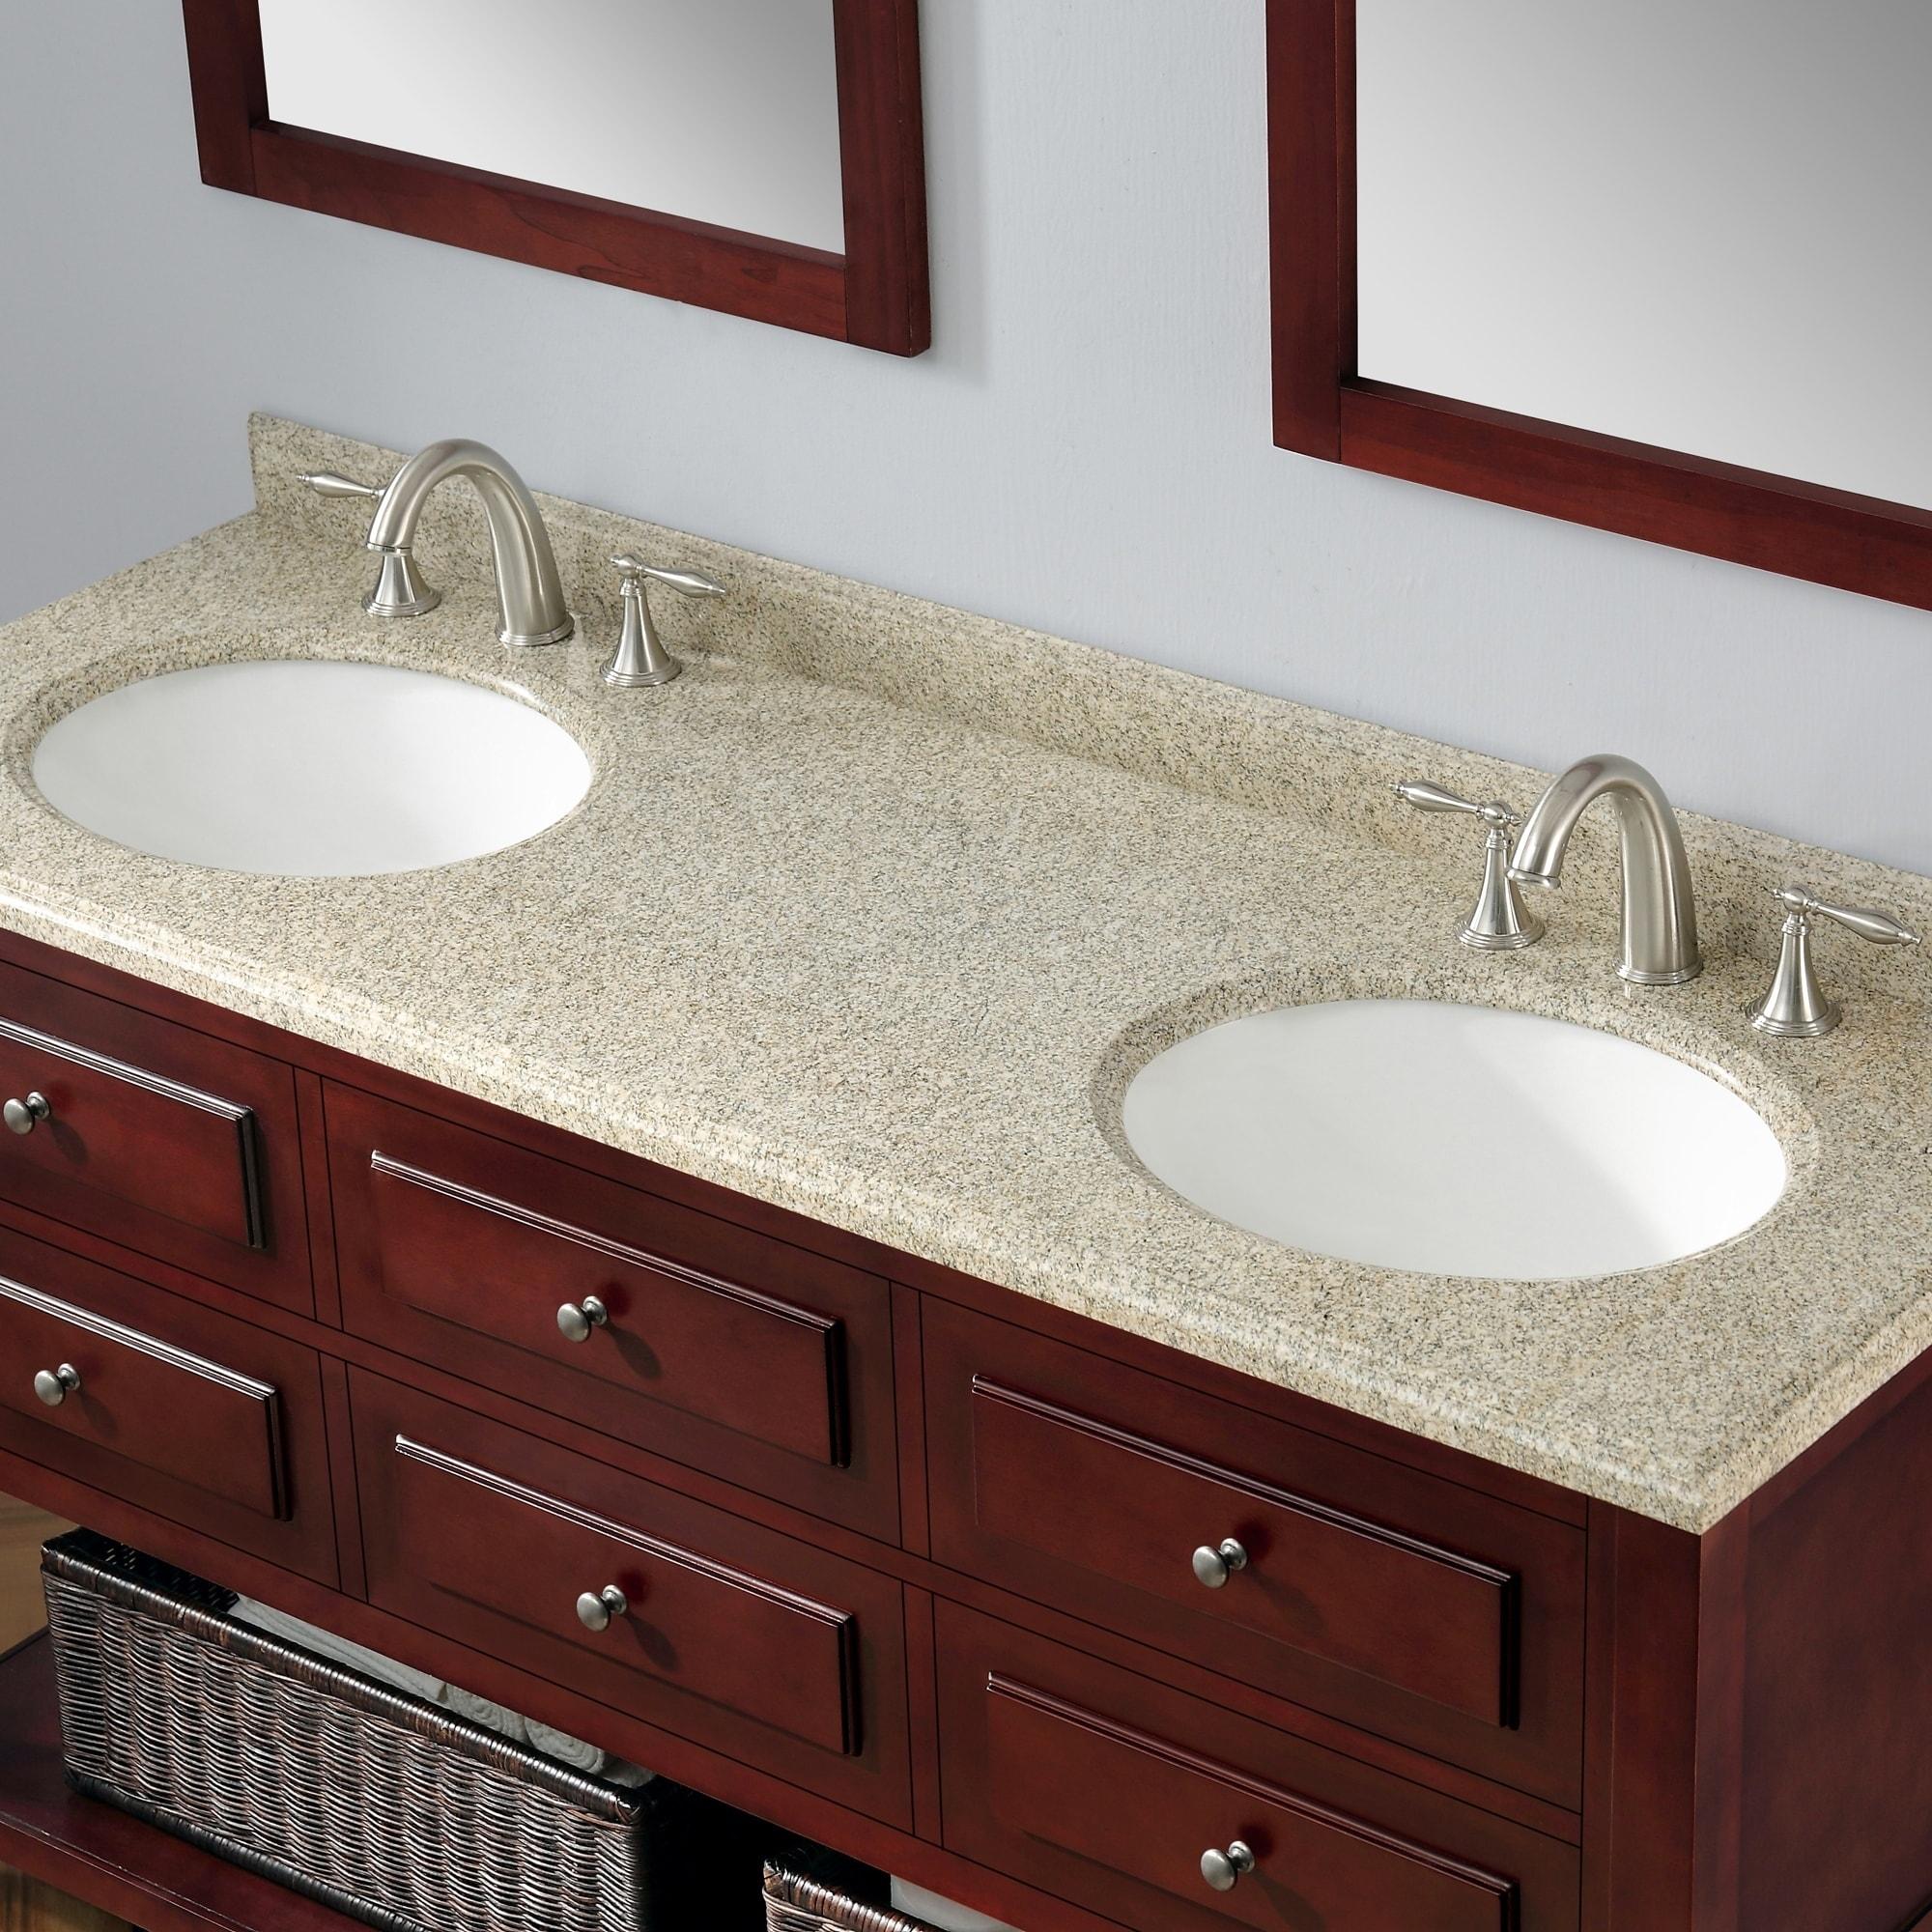 Ove Decors Danny 60 Inch Double Sink Bathroom Vanity Granite